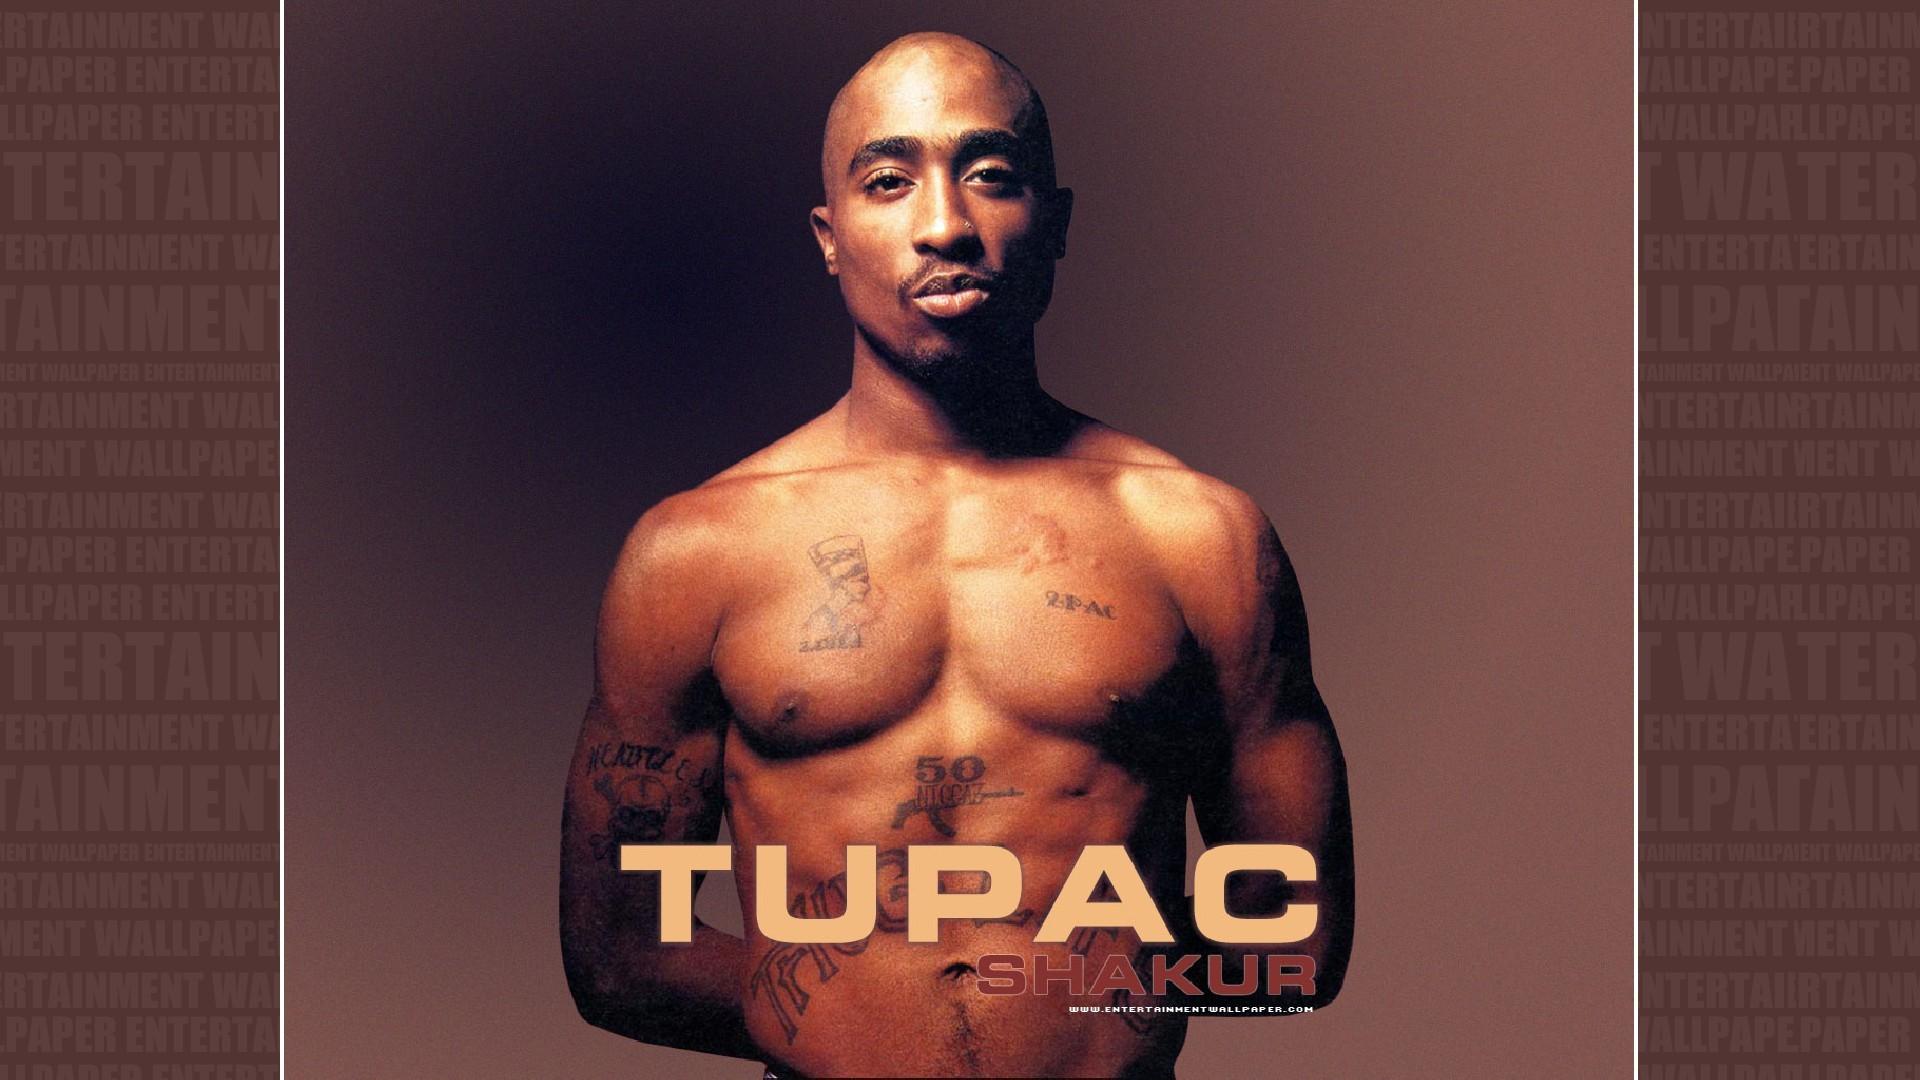 Tupac greatest lyrics